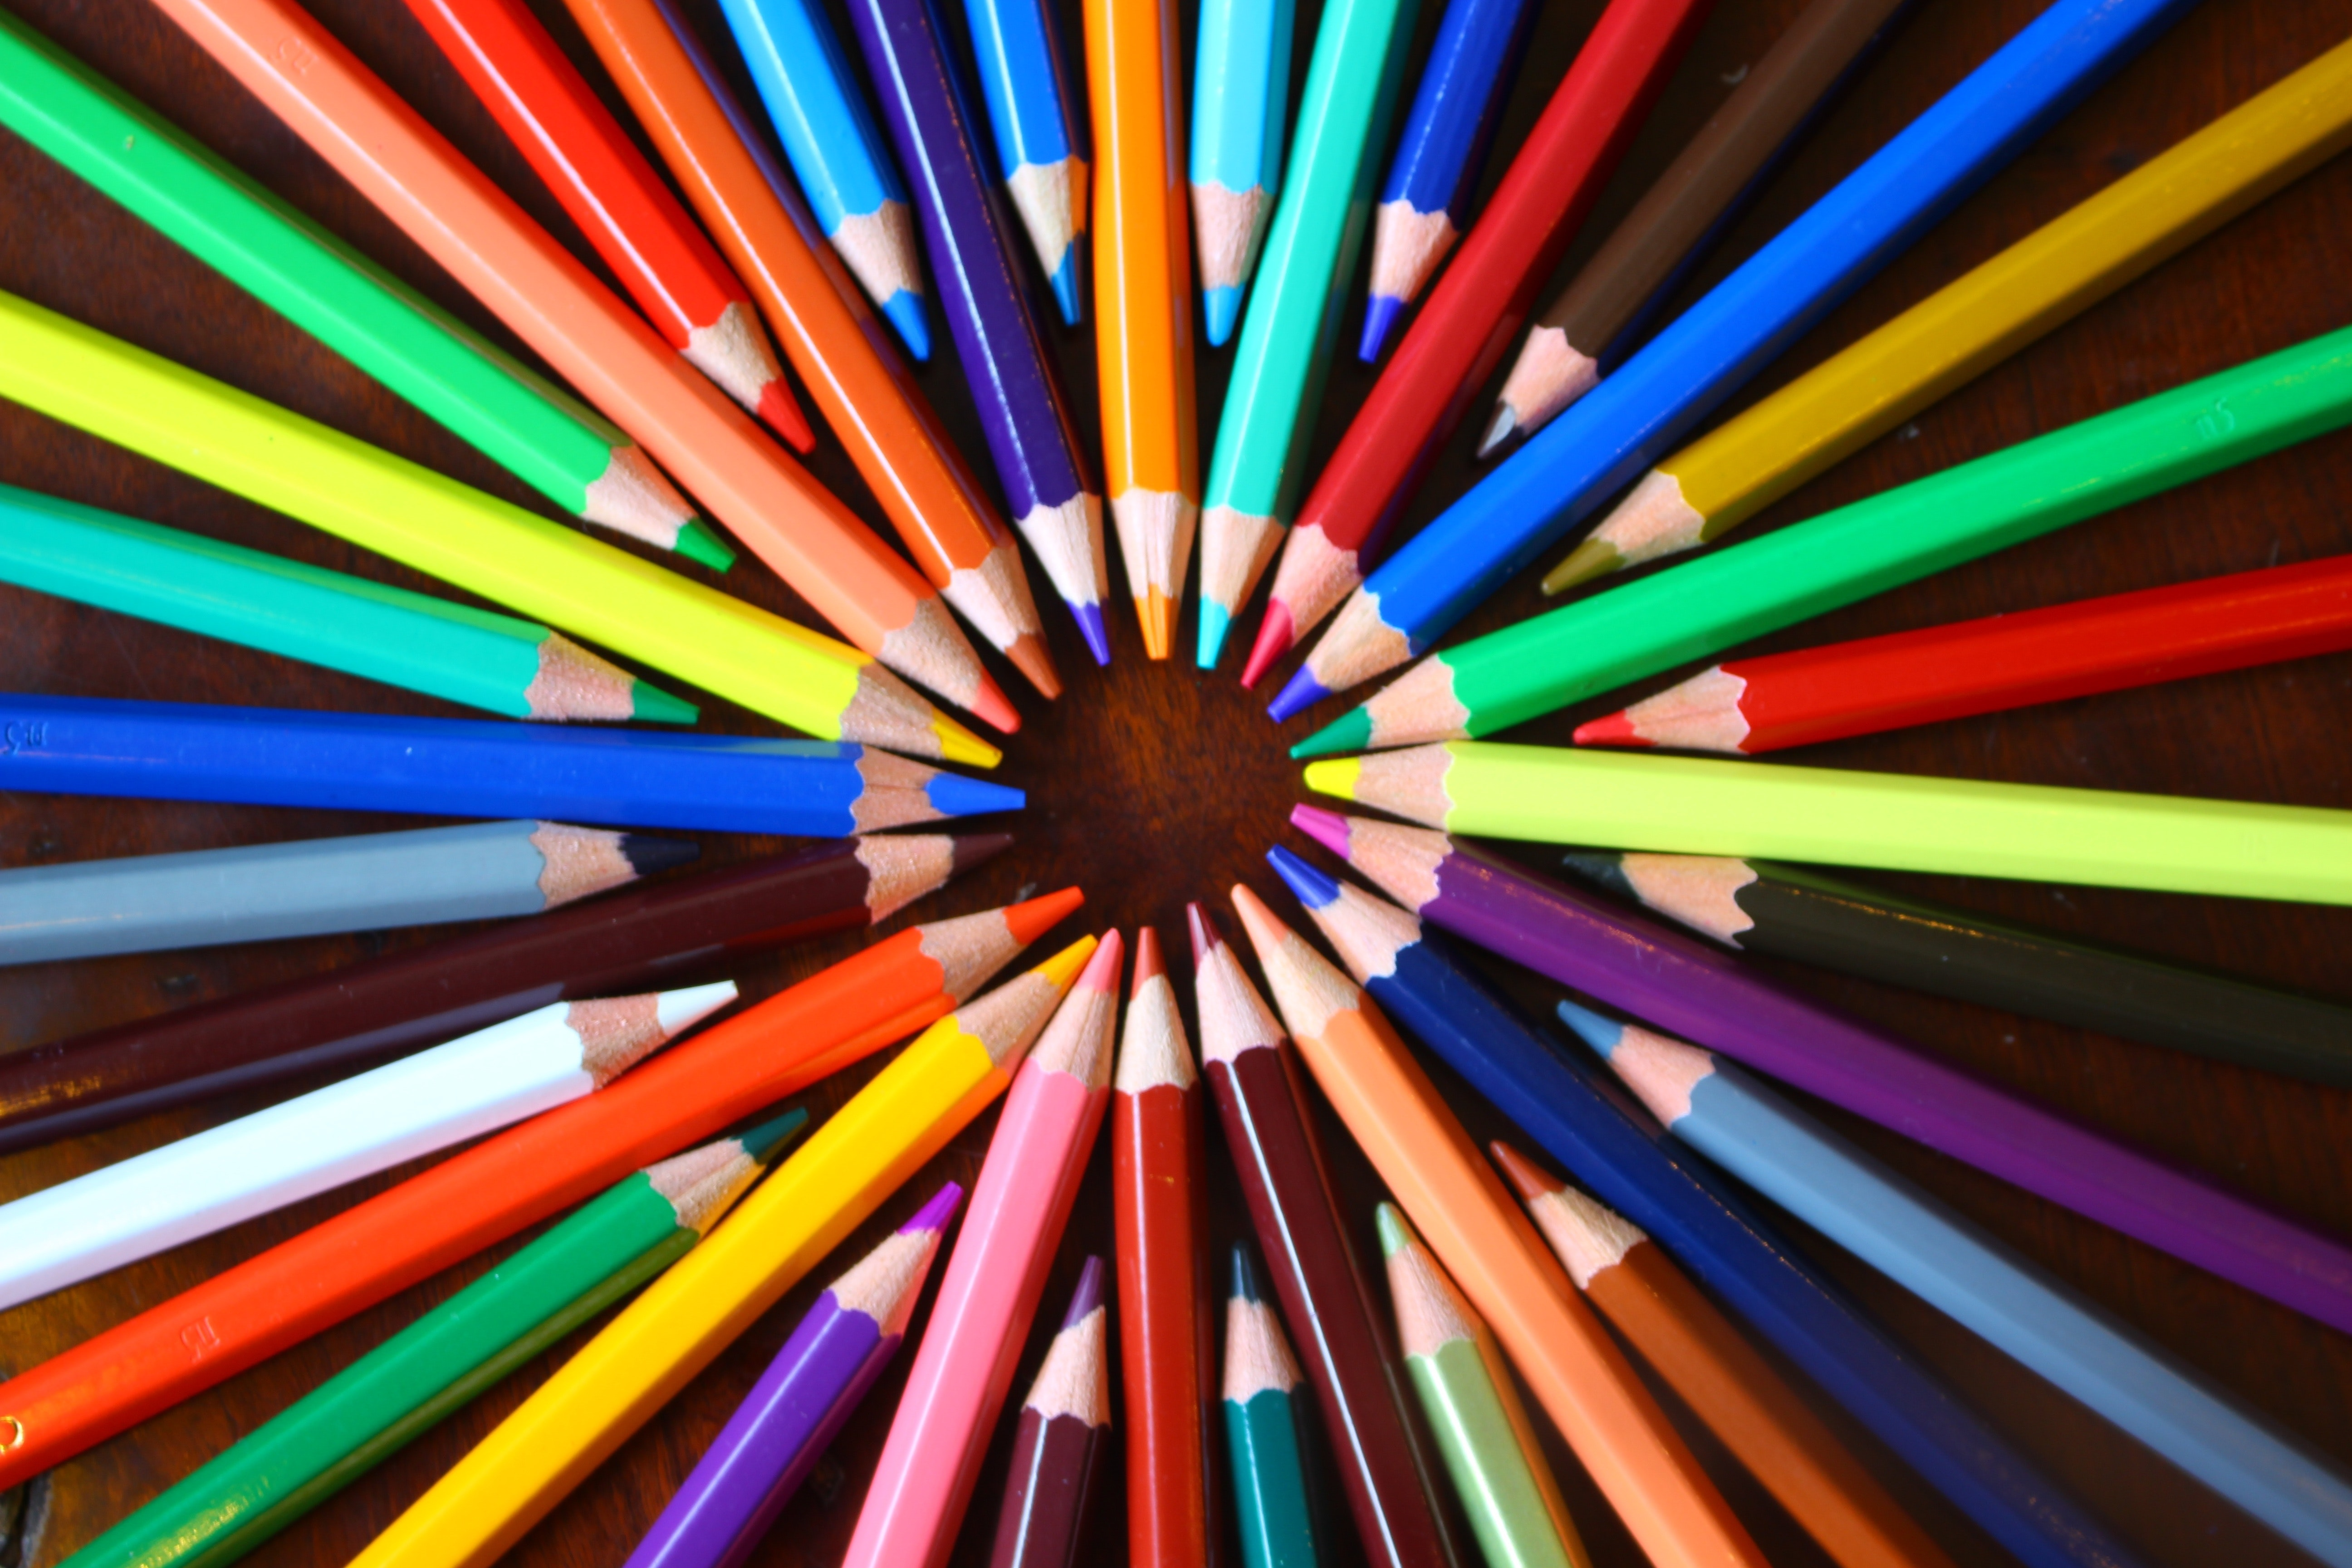 intelligent-data-hub-pencils-blog